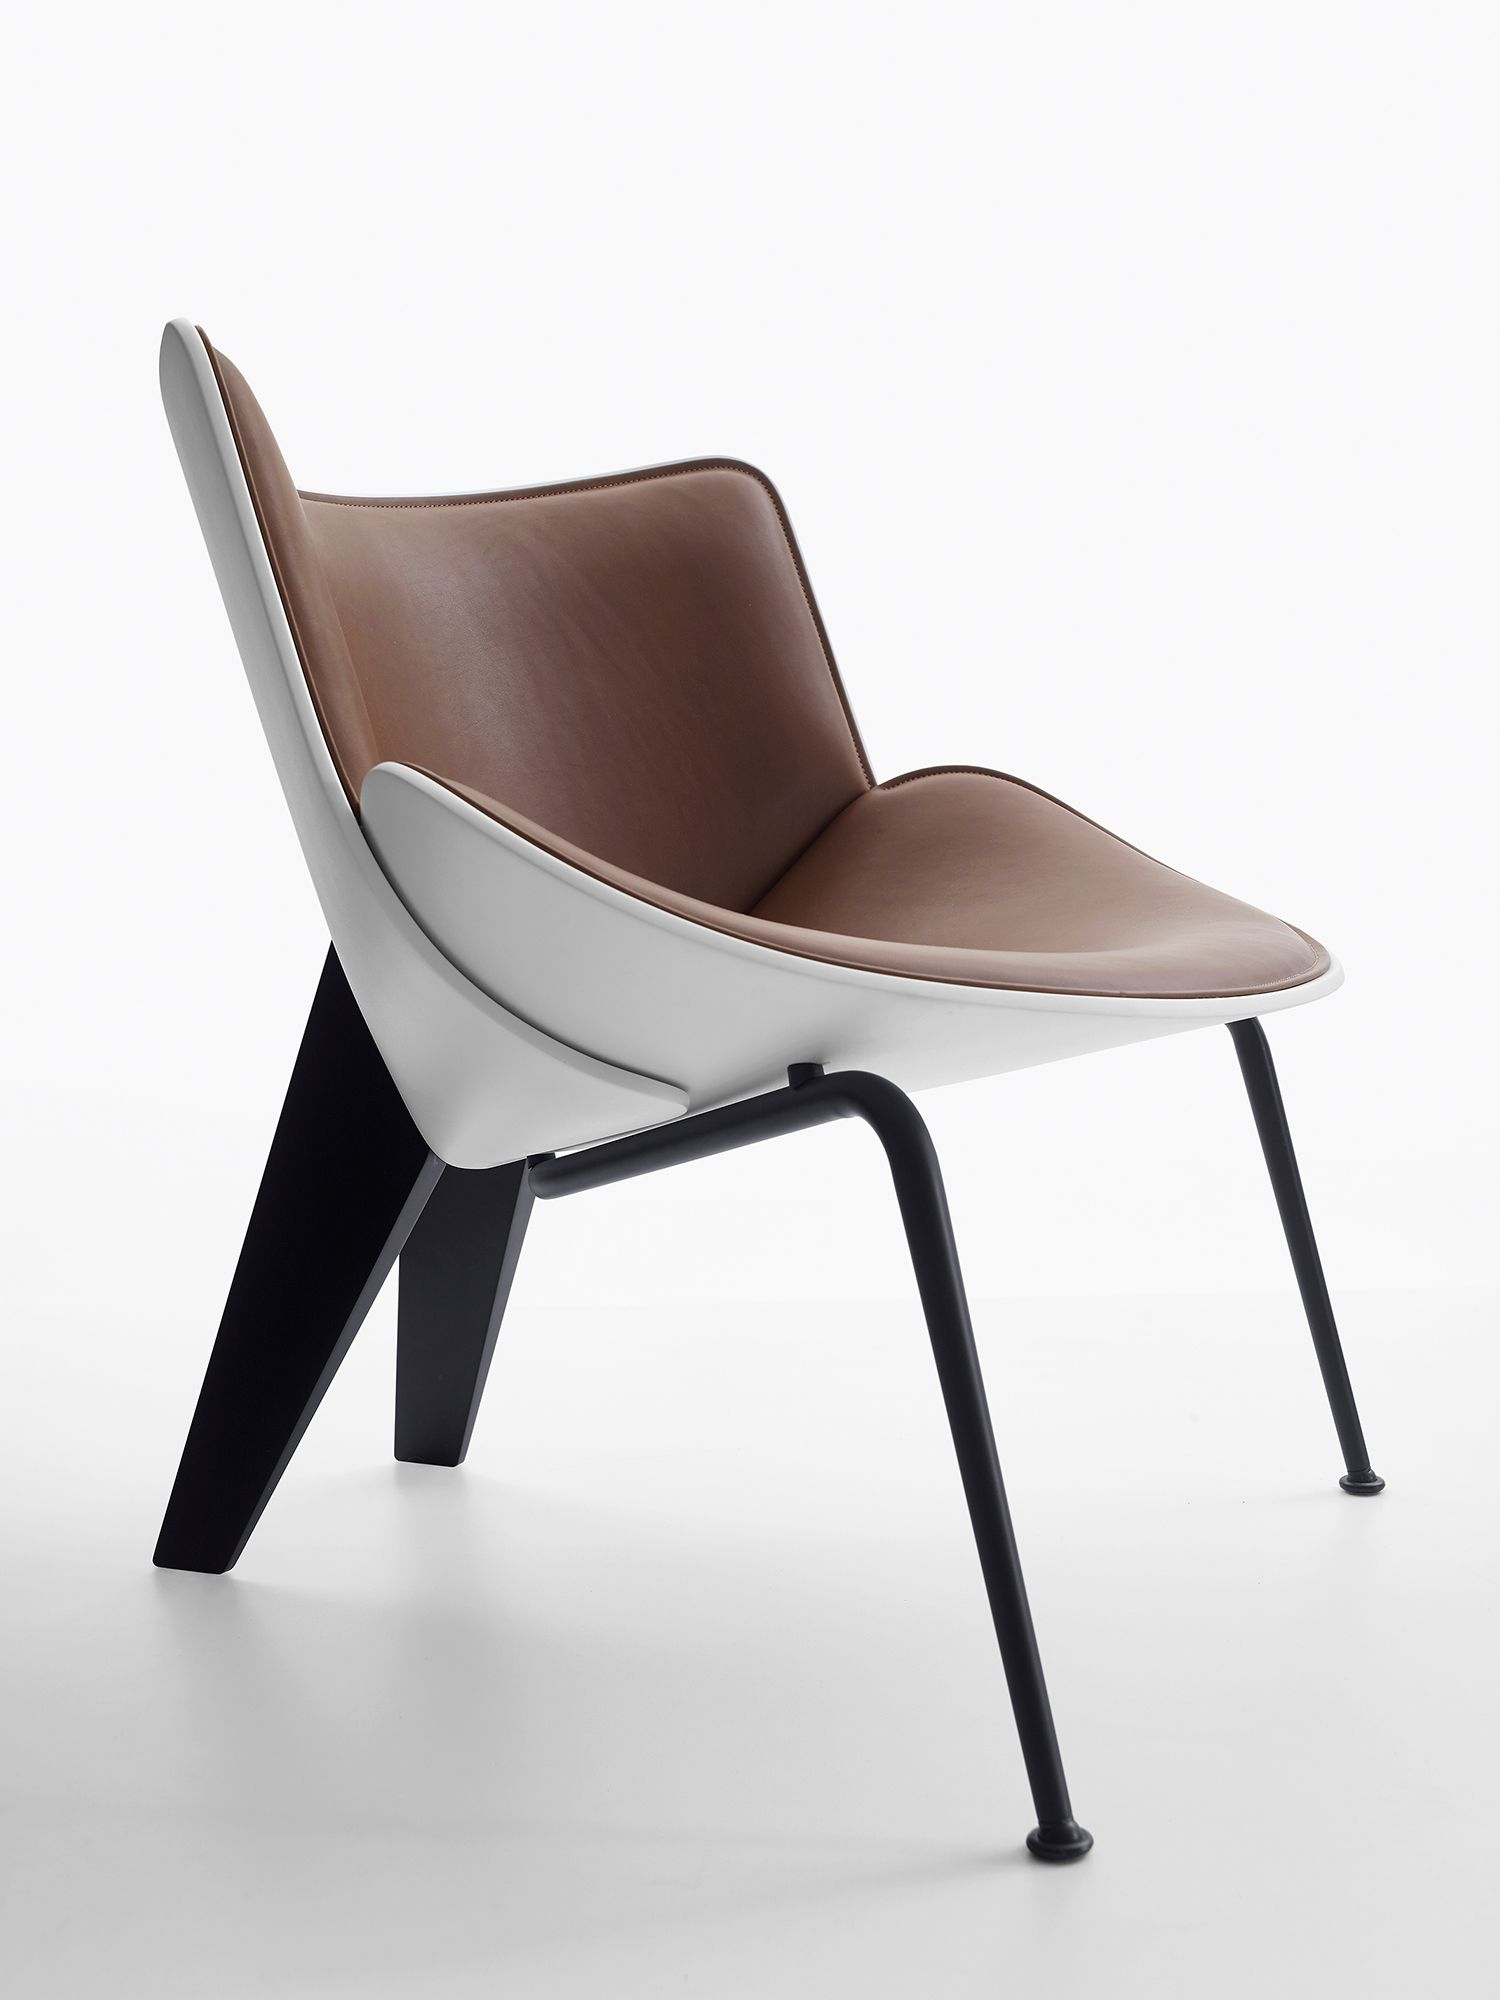 space furniture chairs. bu0026b italia domaru armchair small armchairsbu0026b italiafurniture chairsspace space furniture chairs t